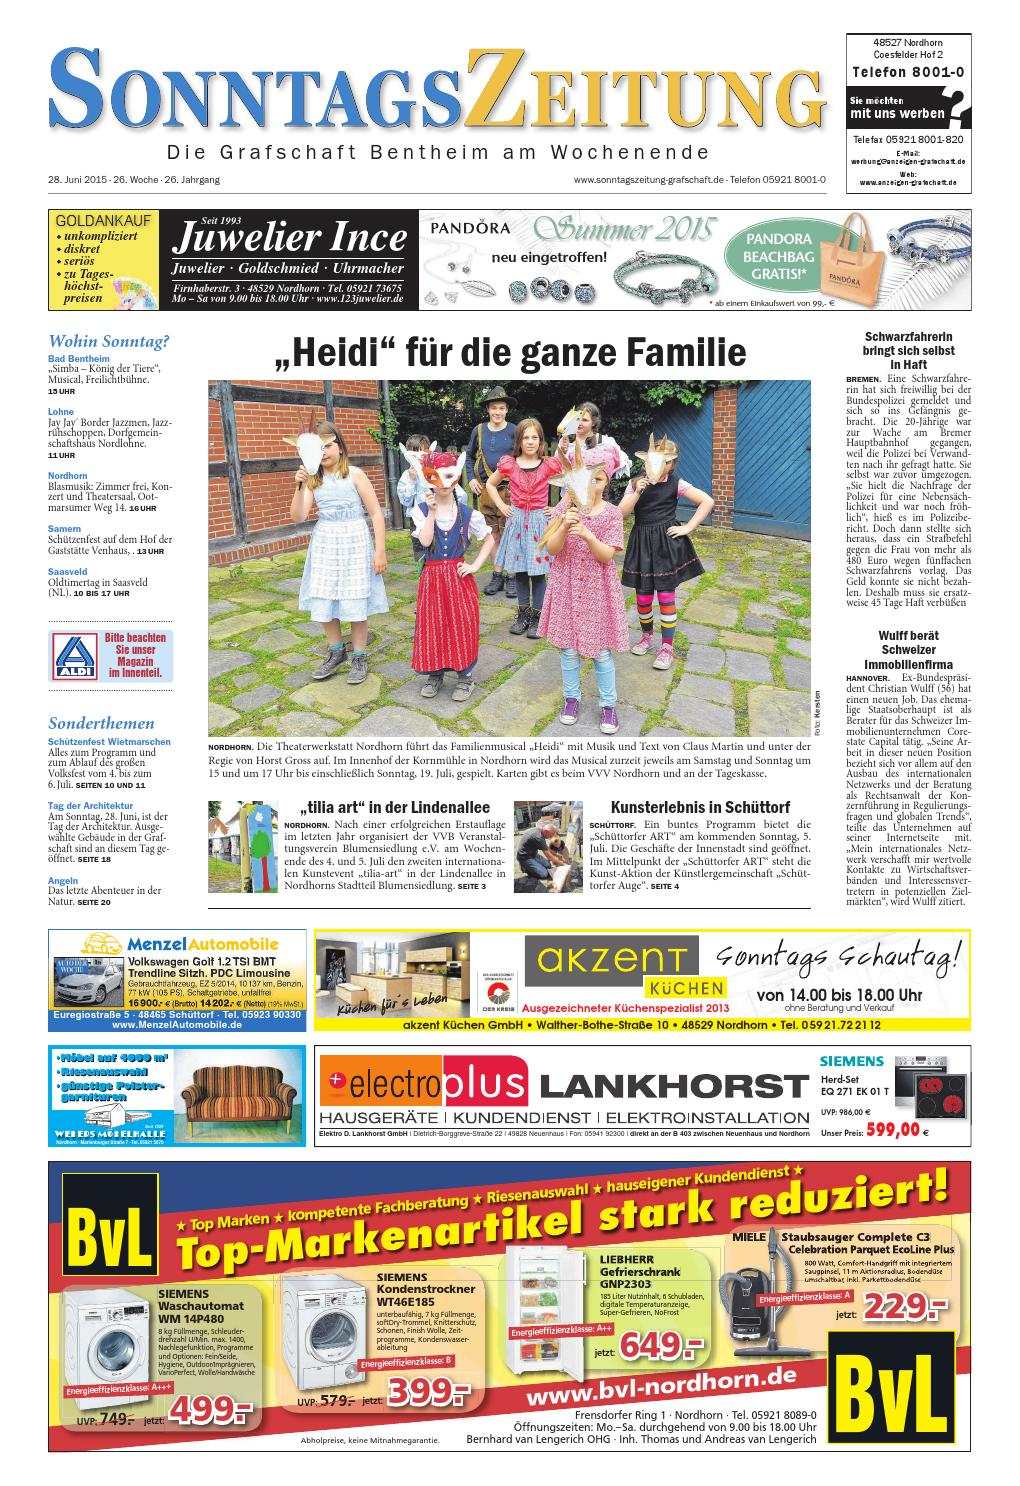 low priced 072fd 62da8 SonntagsZeitung28.06.2015 by SonntagsZeitung - issuu